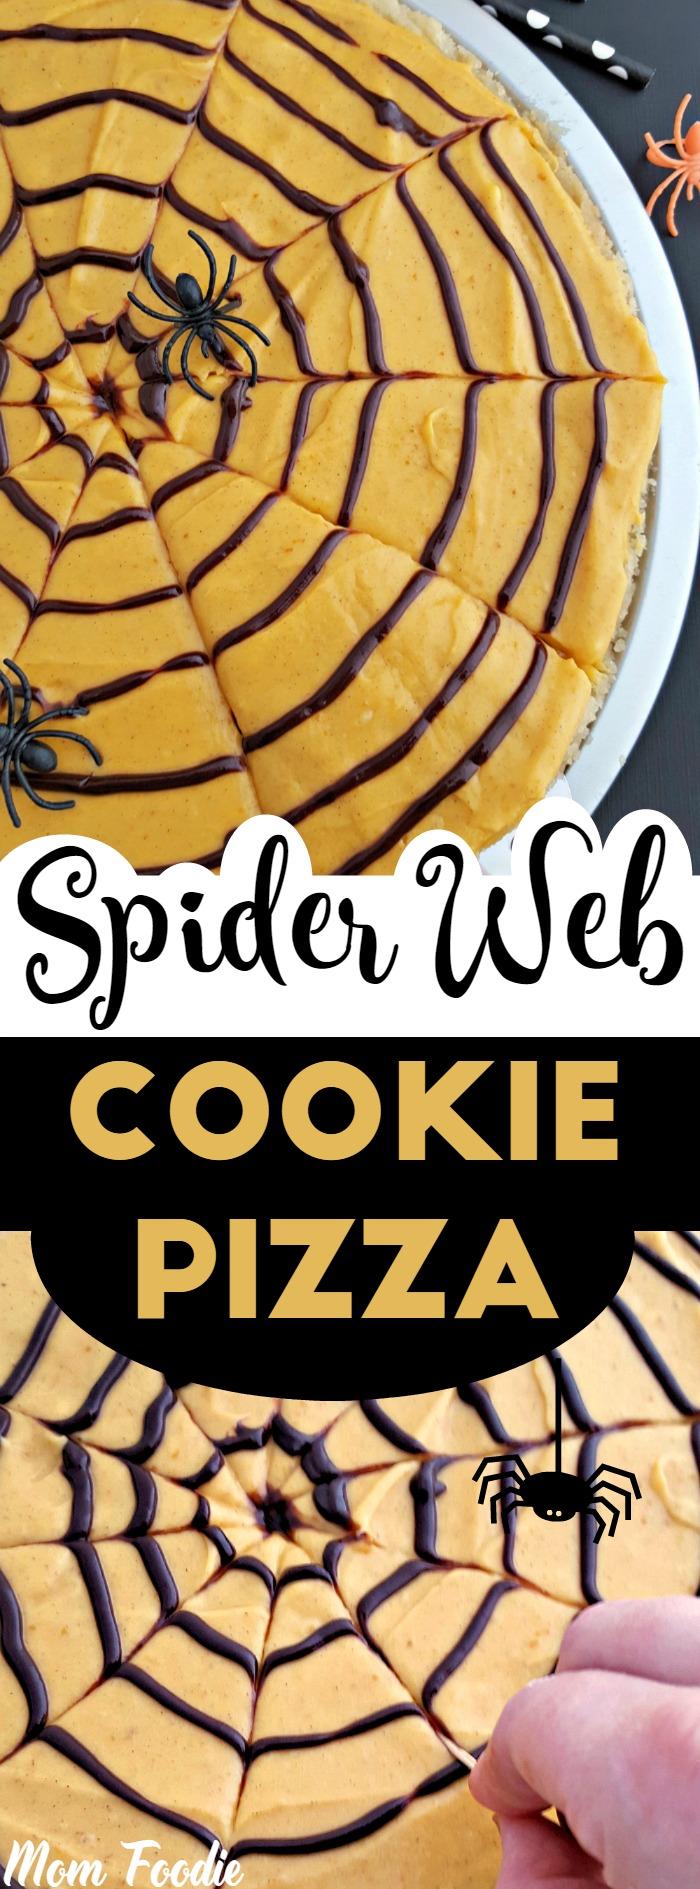 Spider Web Cookie Pizza